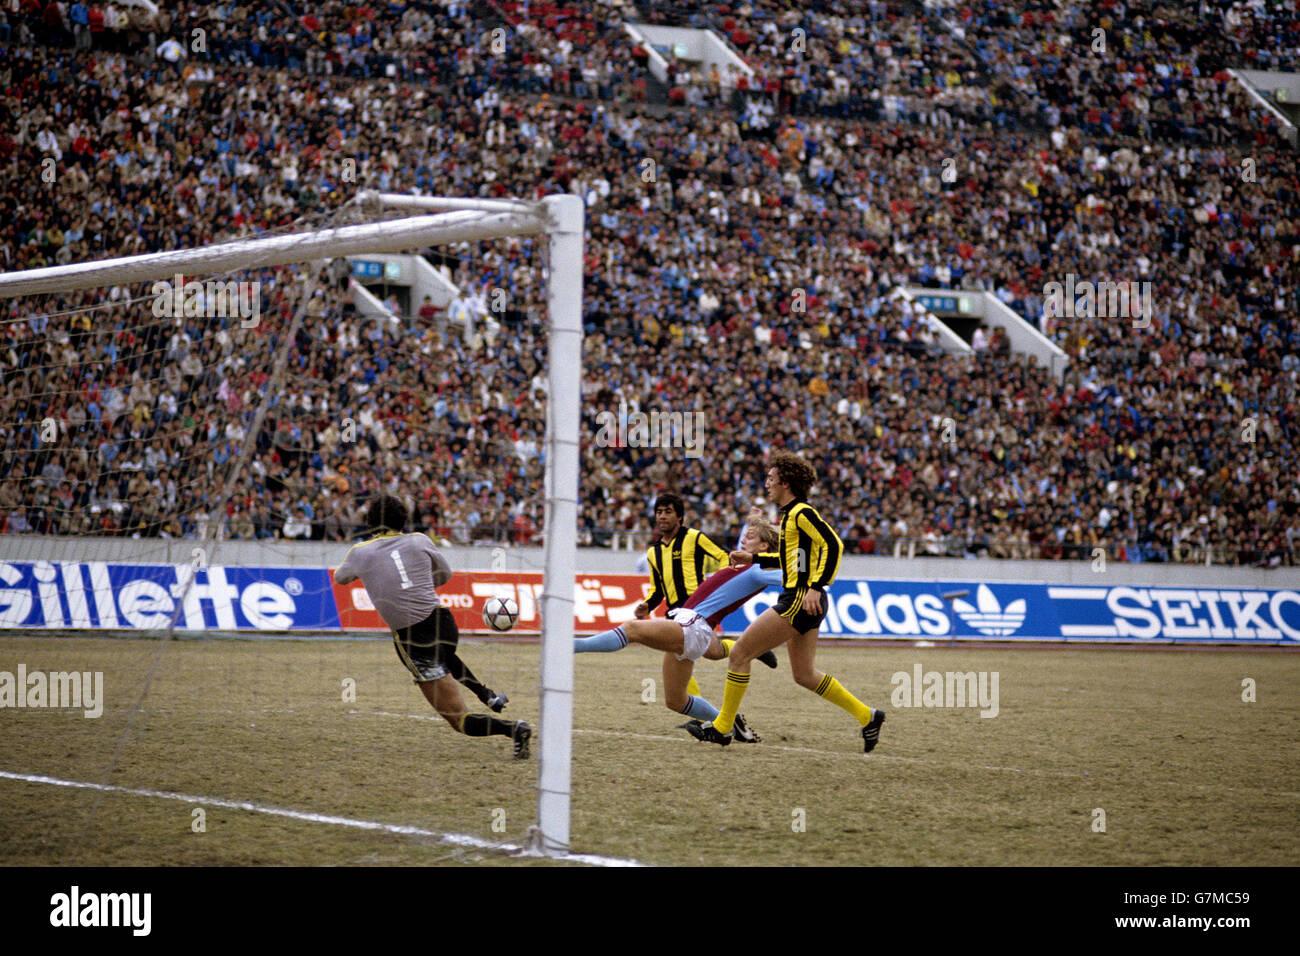 Soccer - Toyota Cup - World Club Championship - Aston Villa v Penarol Stock Photo